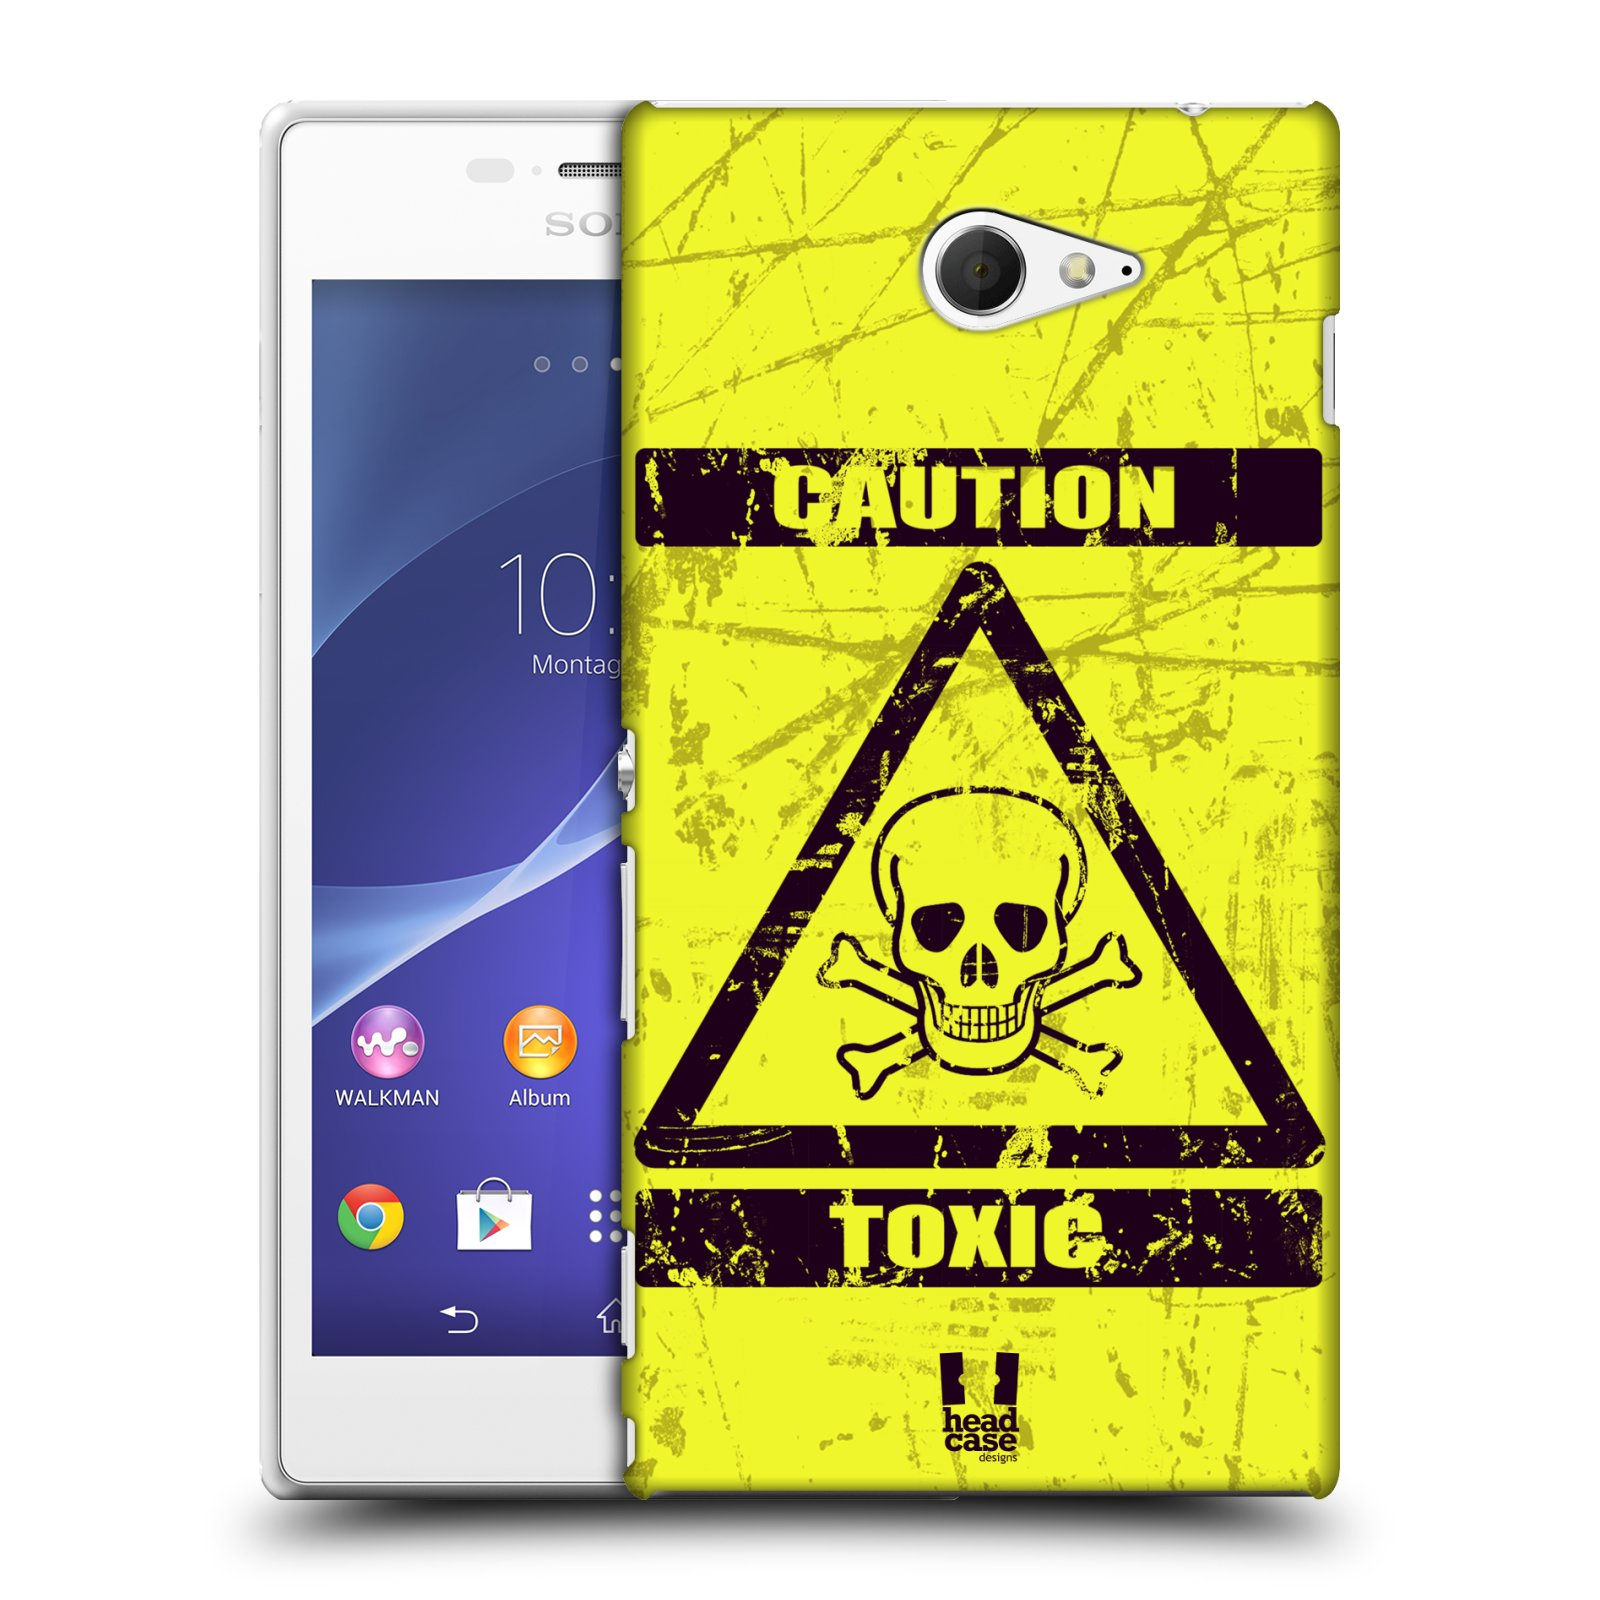 Plastové pouzdro na mobil Sony Xperia M2 D2303 HEAD CASE TOXIC (Kryt či obal na mobilní telefon Sony Xperia M2 )